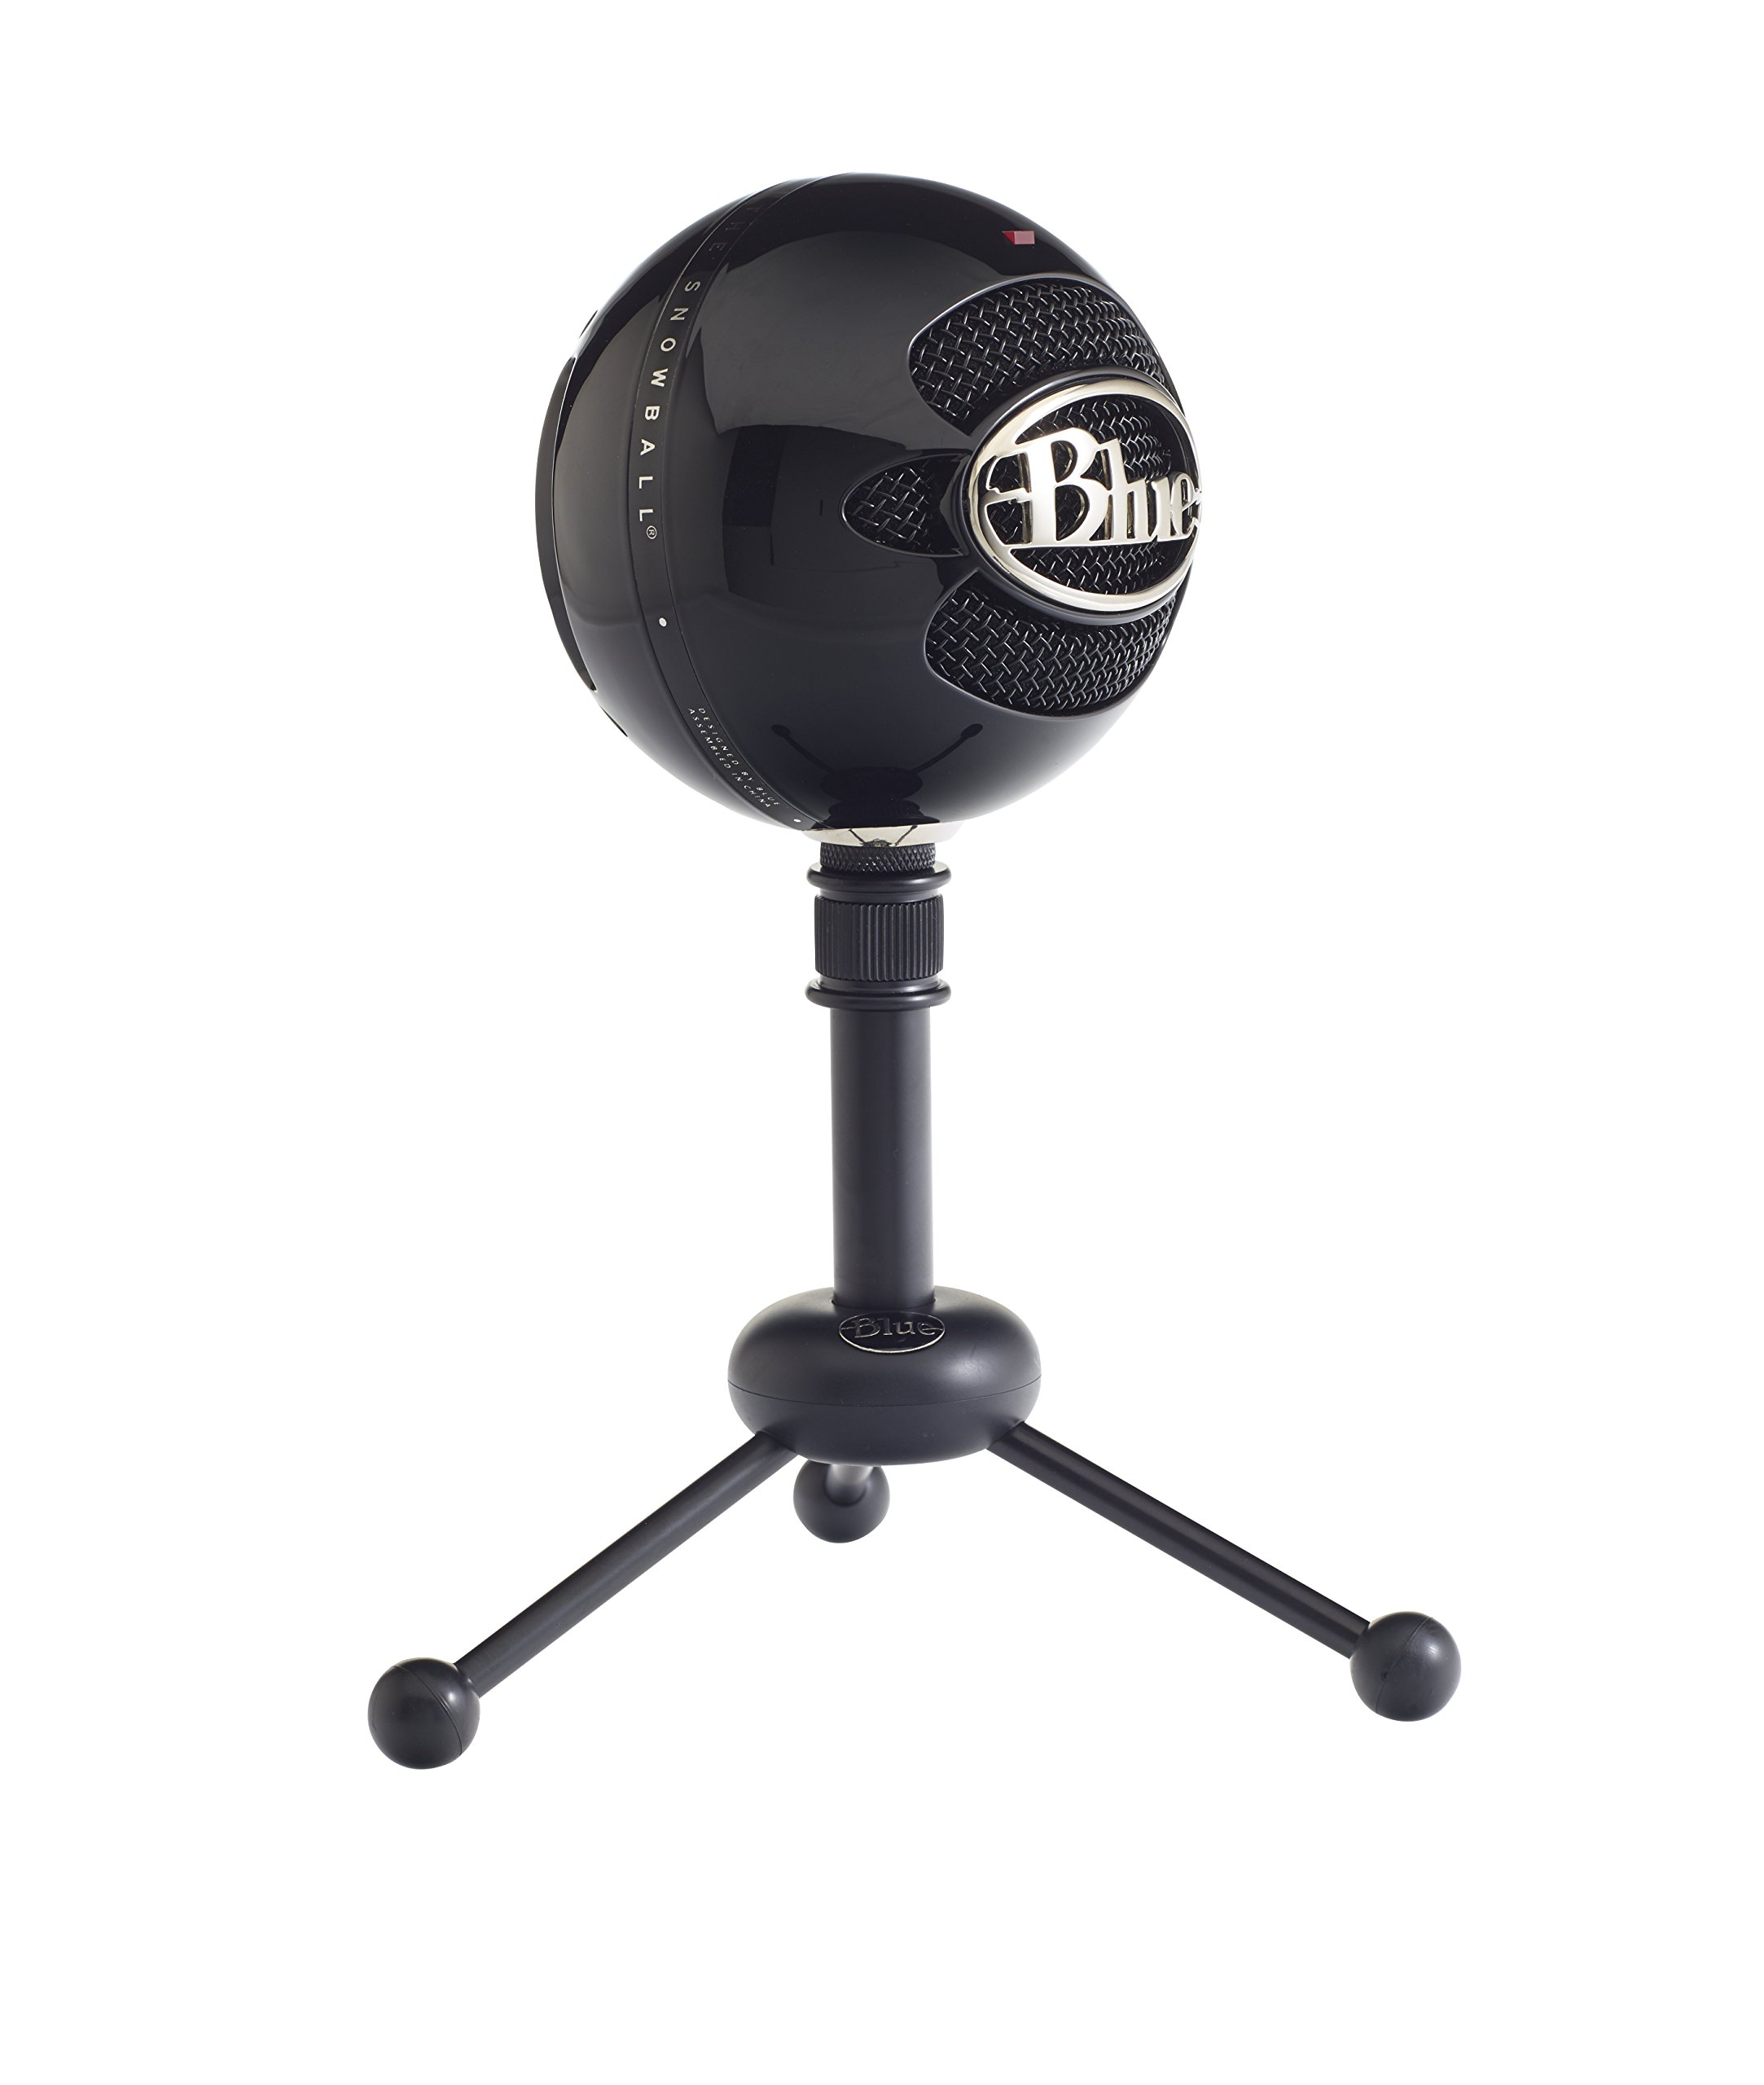 Usb Microphone Blue Snowball : blue snowball usb microphone gloss black techadict ~ Russianpoet.info Haus und Dekorationen